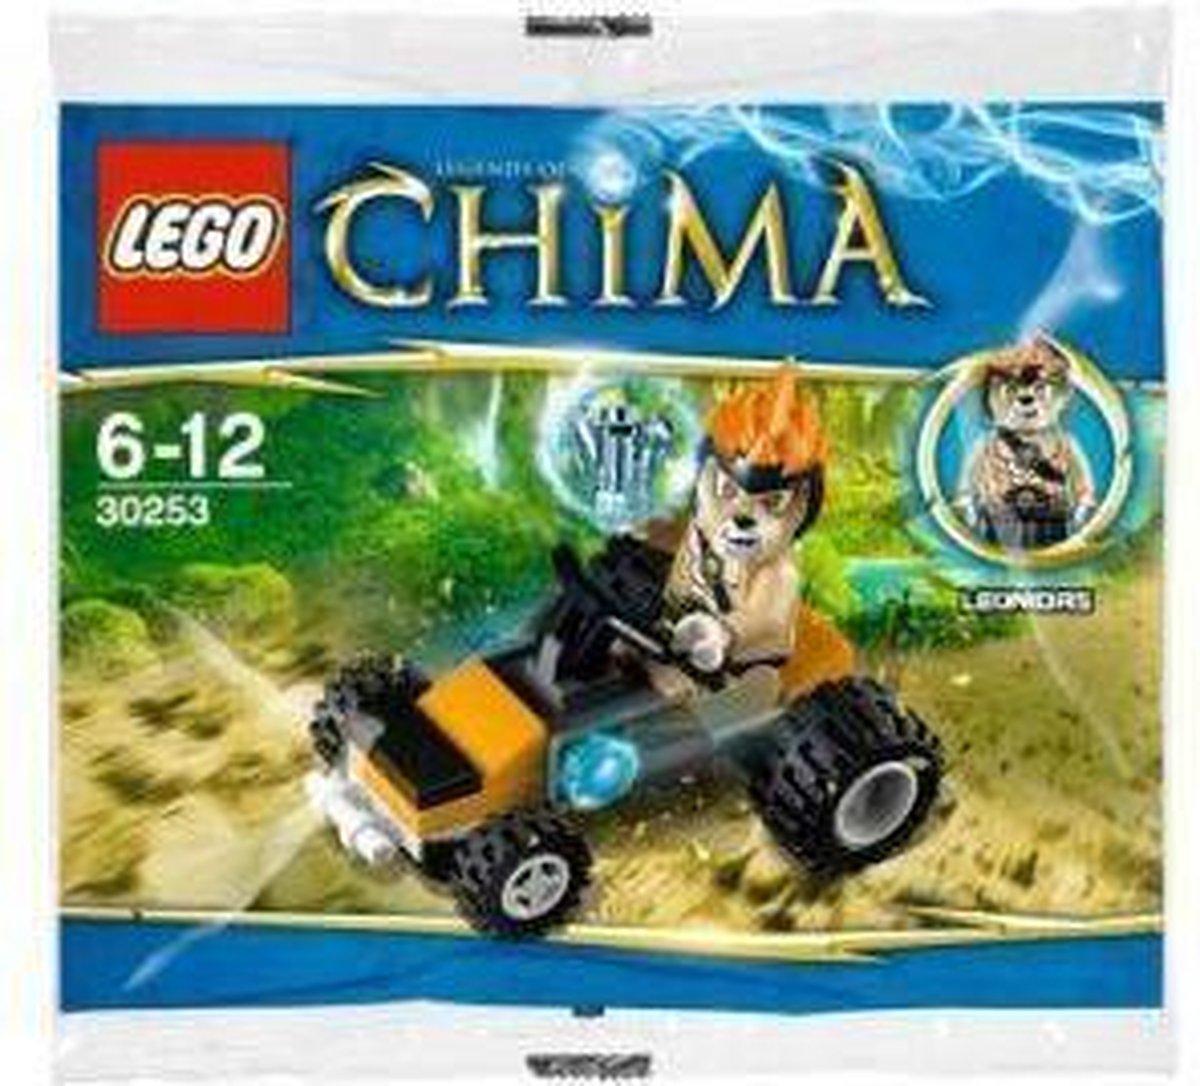 LEGO Chima Leonidas